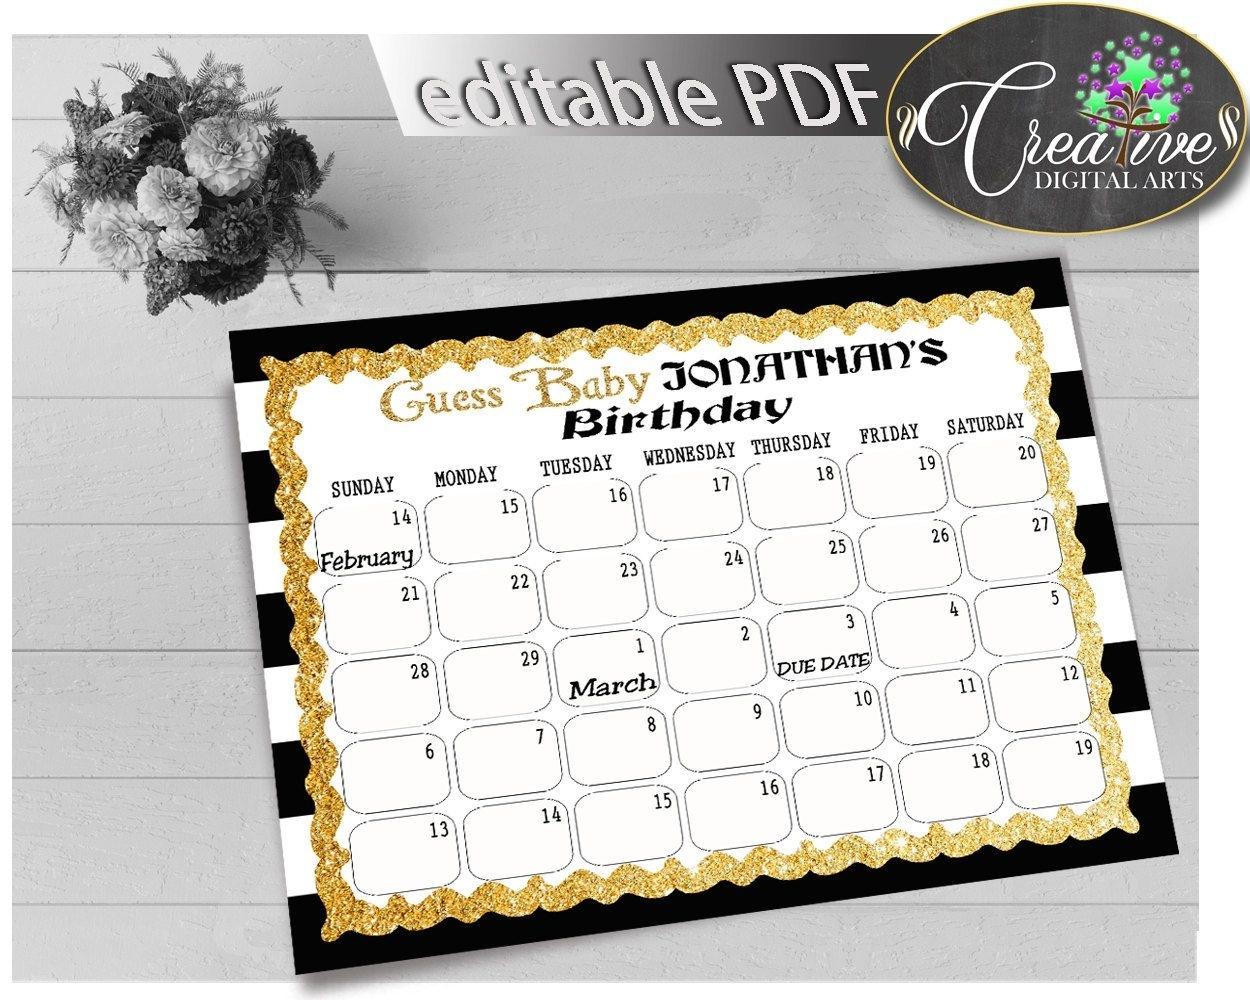 Due Date Guess February Calendar | Calendar Template 2021